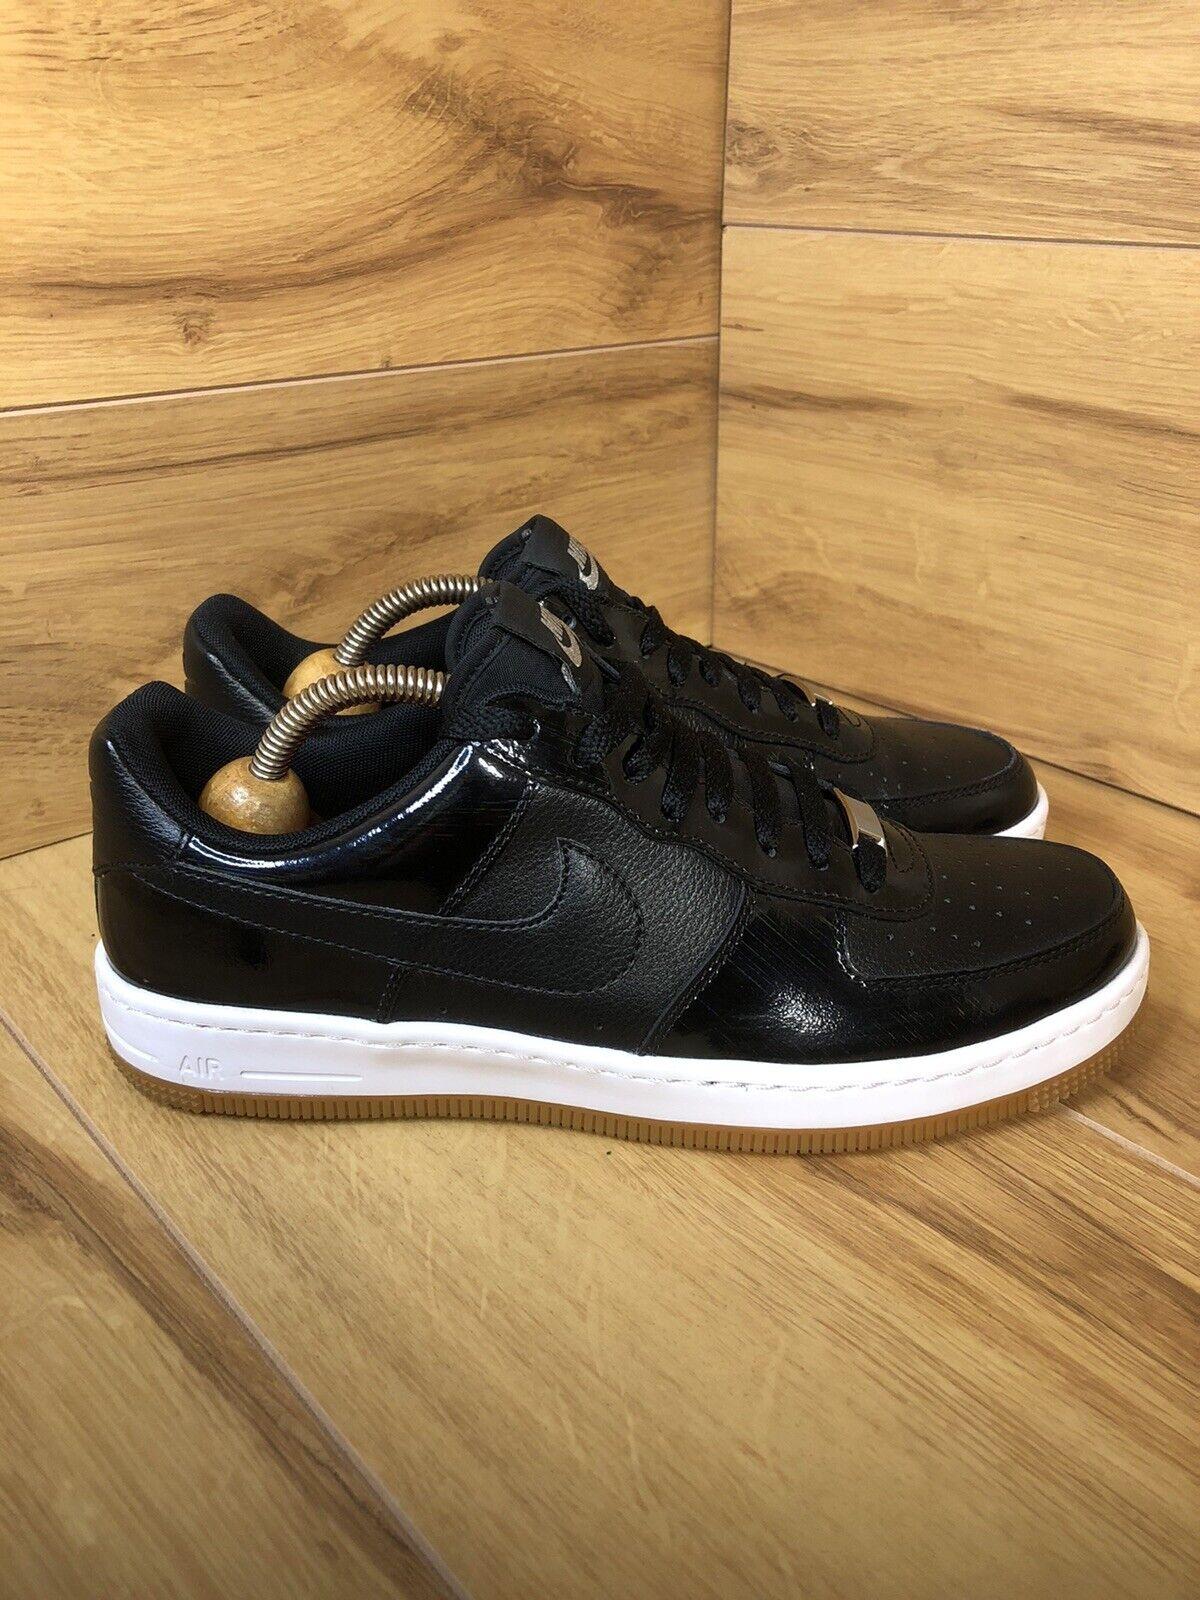 Nike Air Force 1 ultra Low, Black & Gum, UK7 EU 41 654852-002 VGC